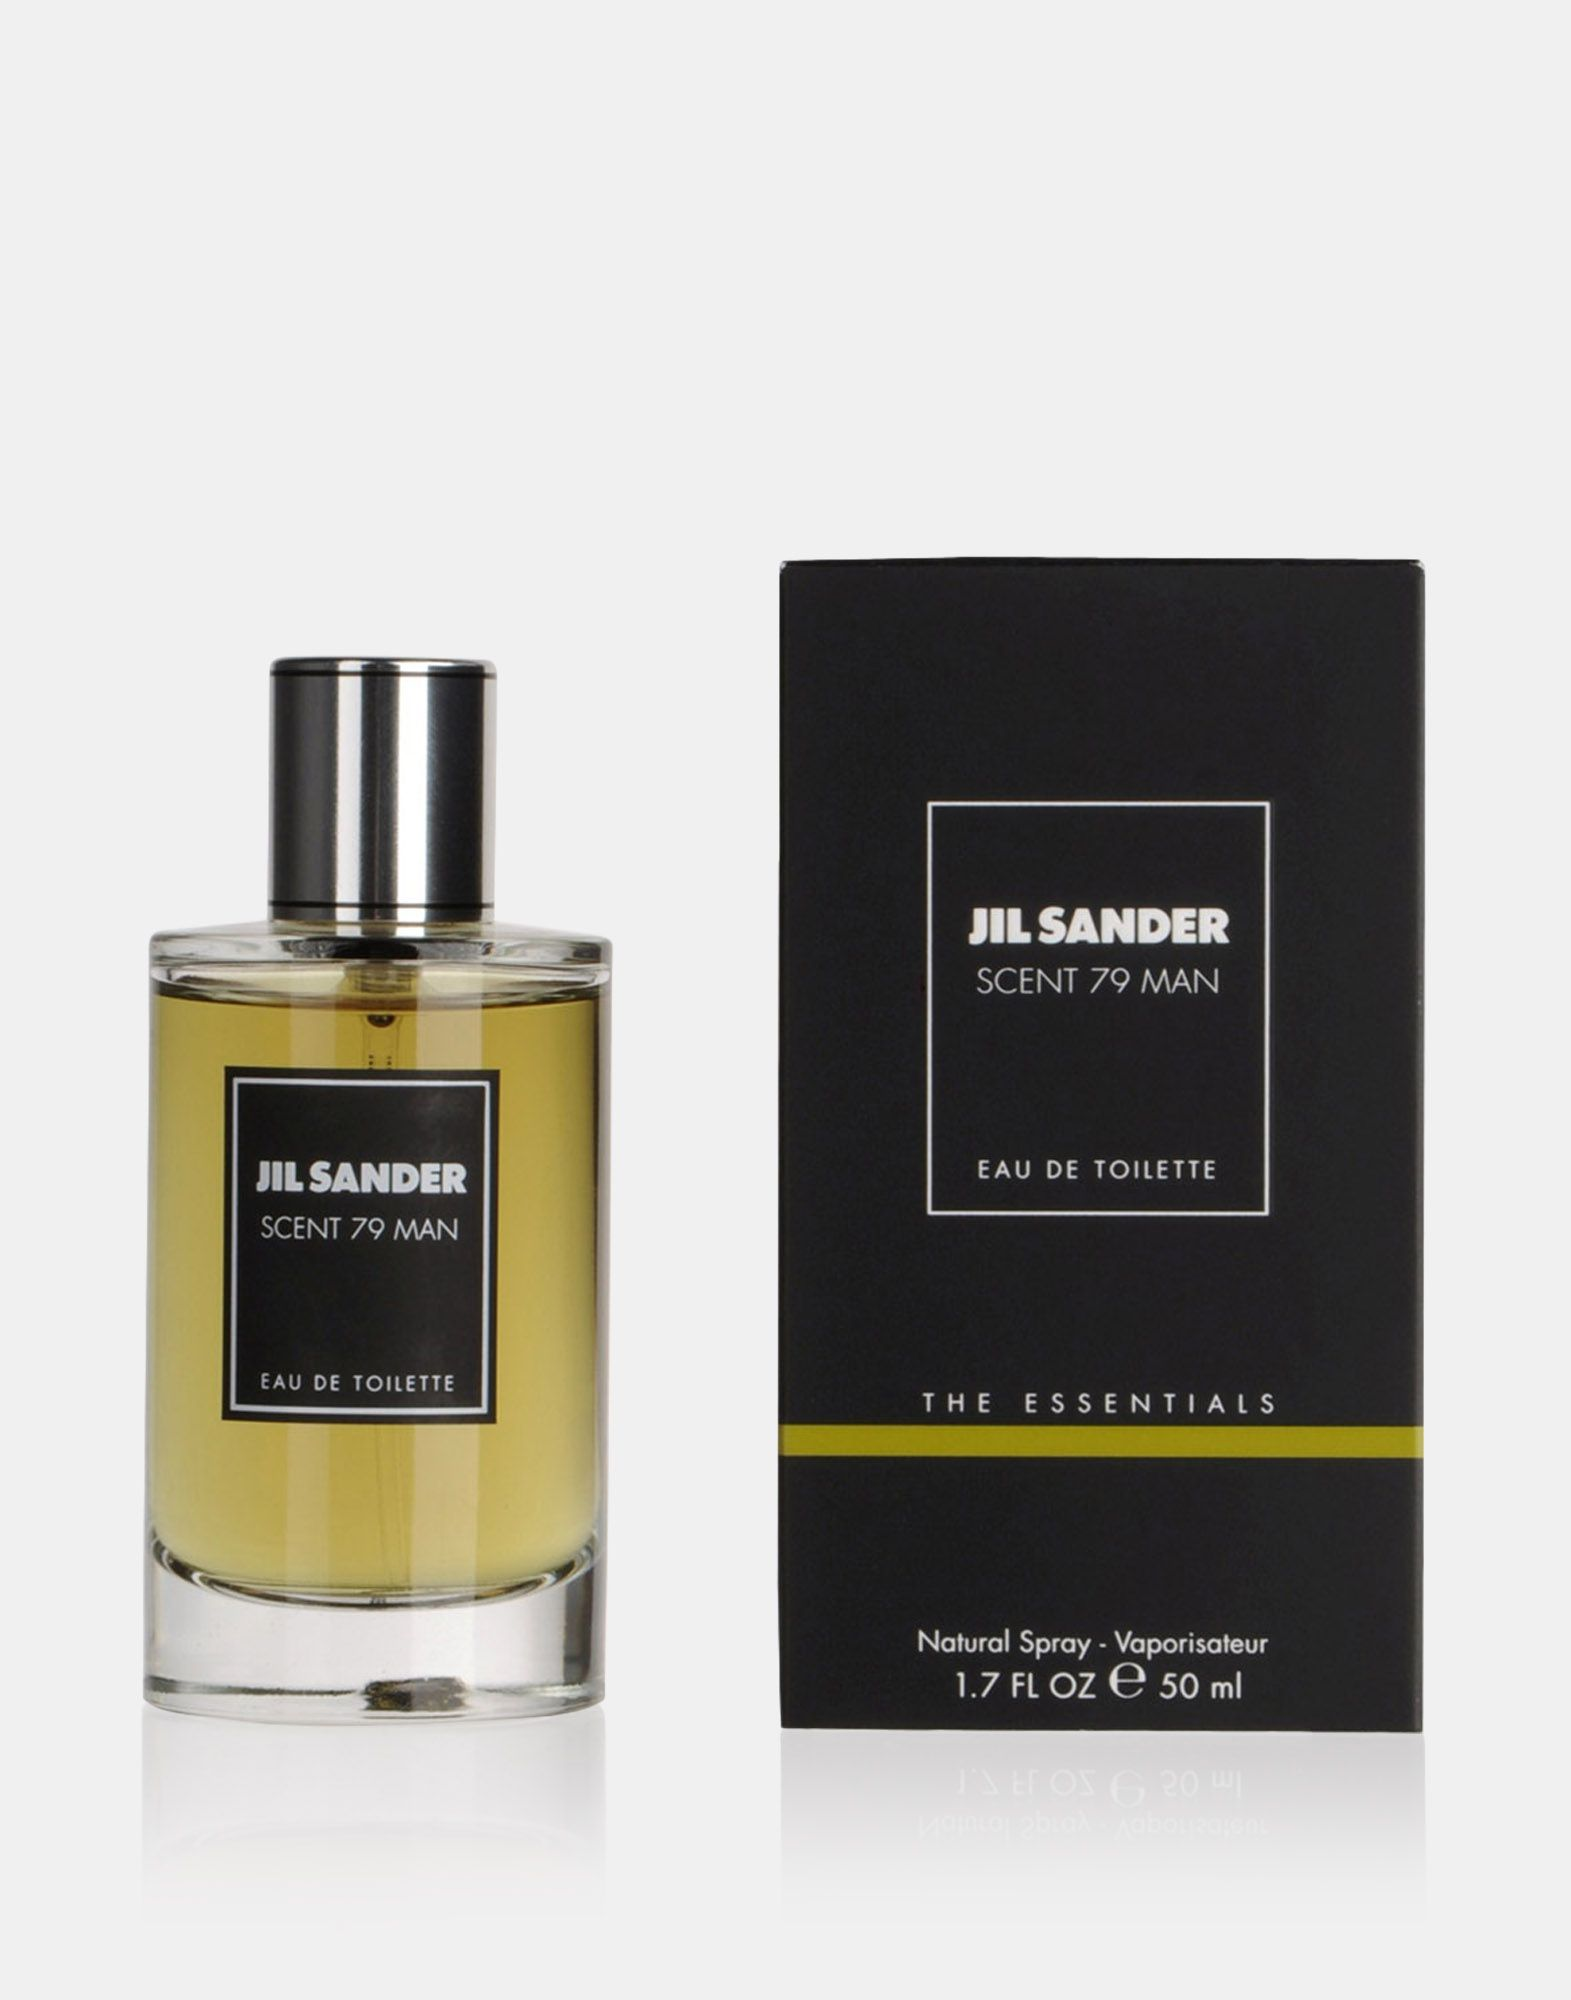 SCENT 79 MAN Fragranza - JIL SANDER Online Store